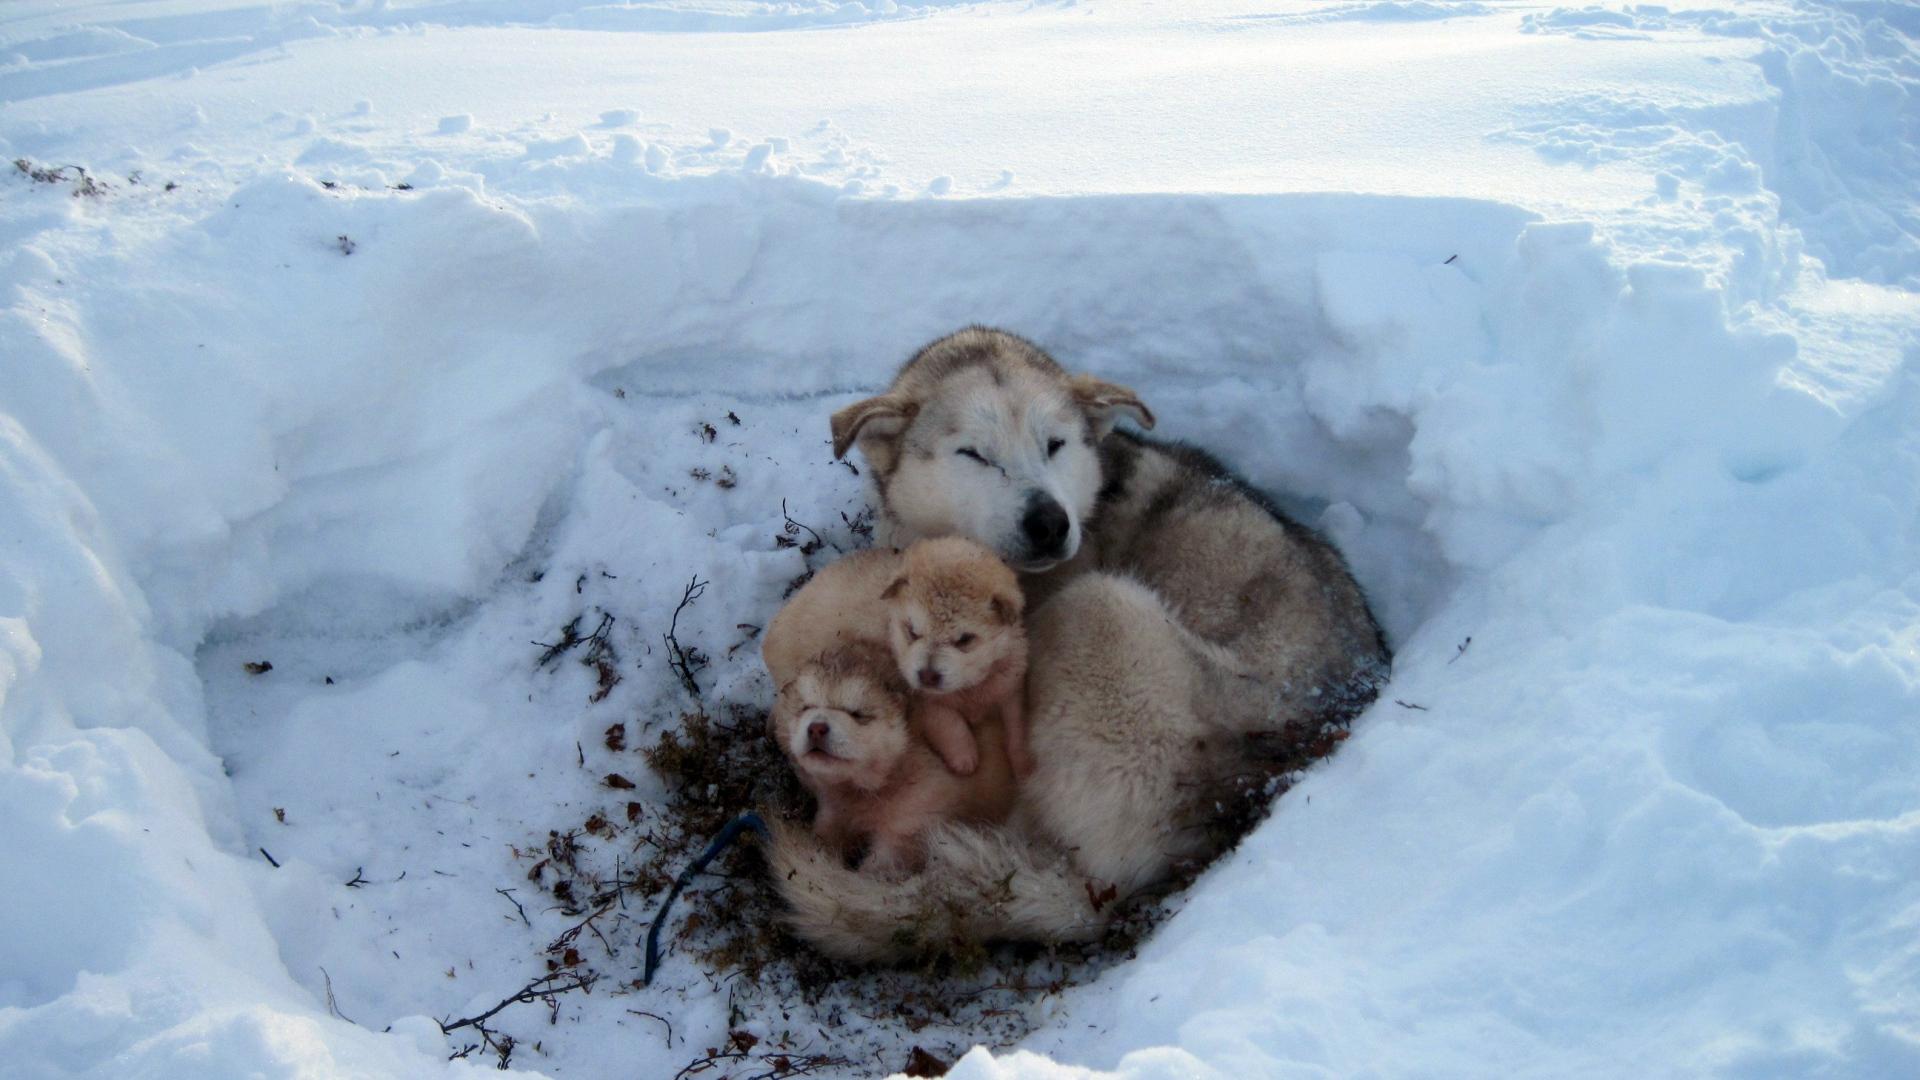 website gallery, design, photos, High Definition D: dogs ...